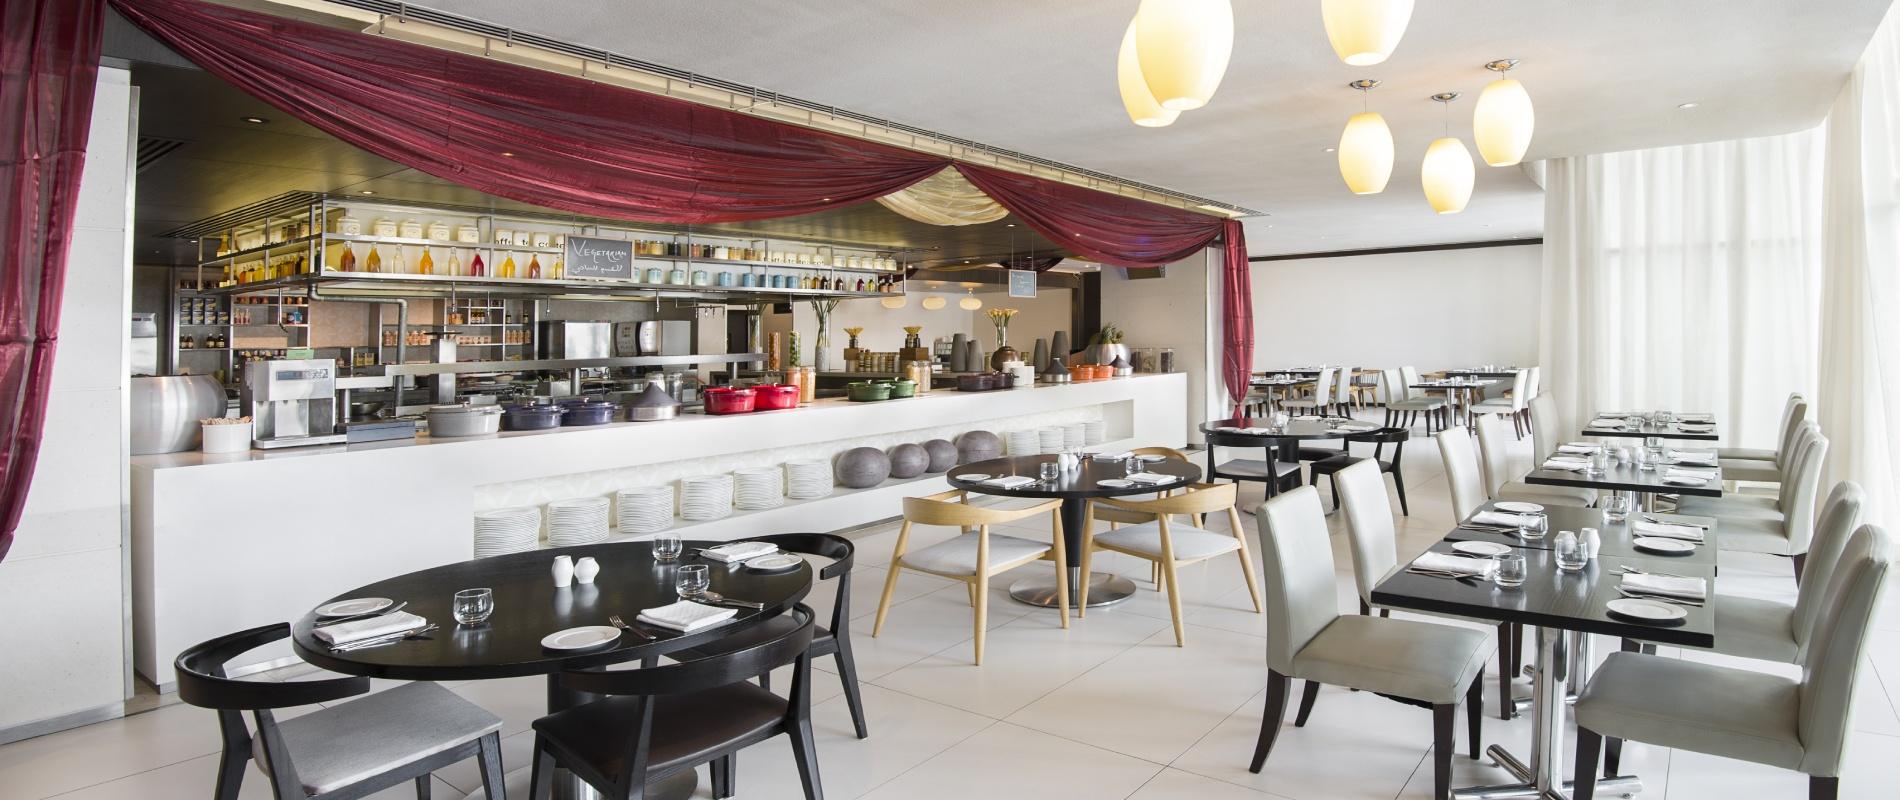 Breakfast Buffet -  Hyatt Place Dubai Al Rigga